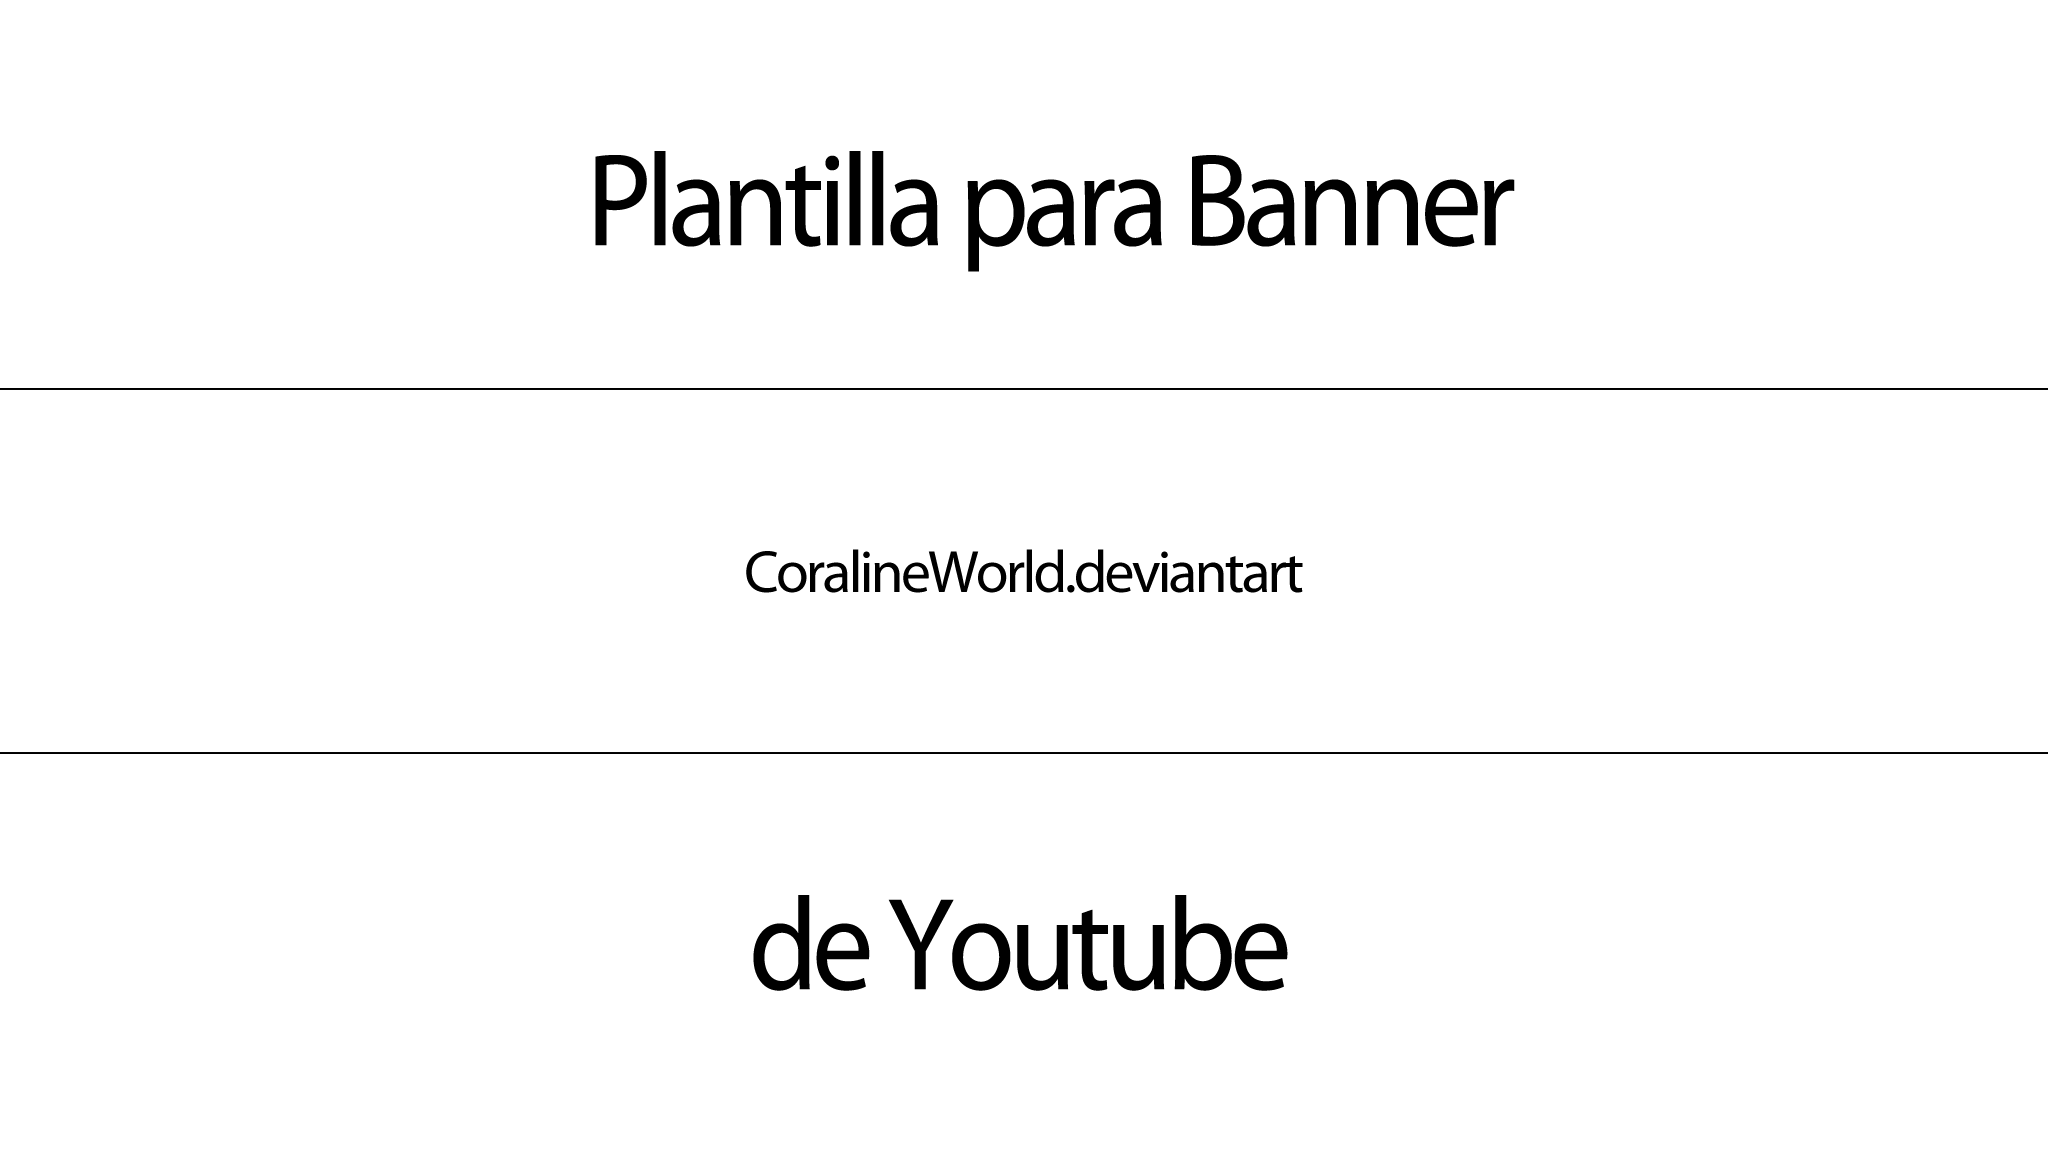 plantilla para youtubede paint - Buscar con Google   plantillas para ...